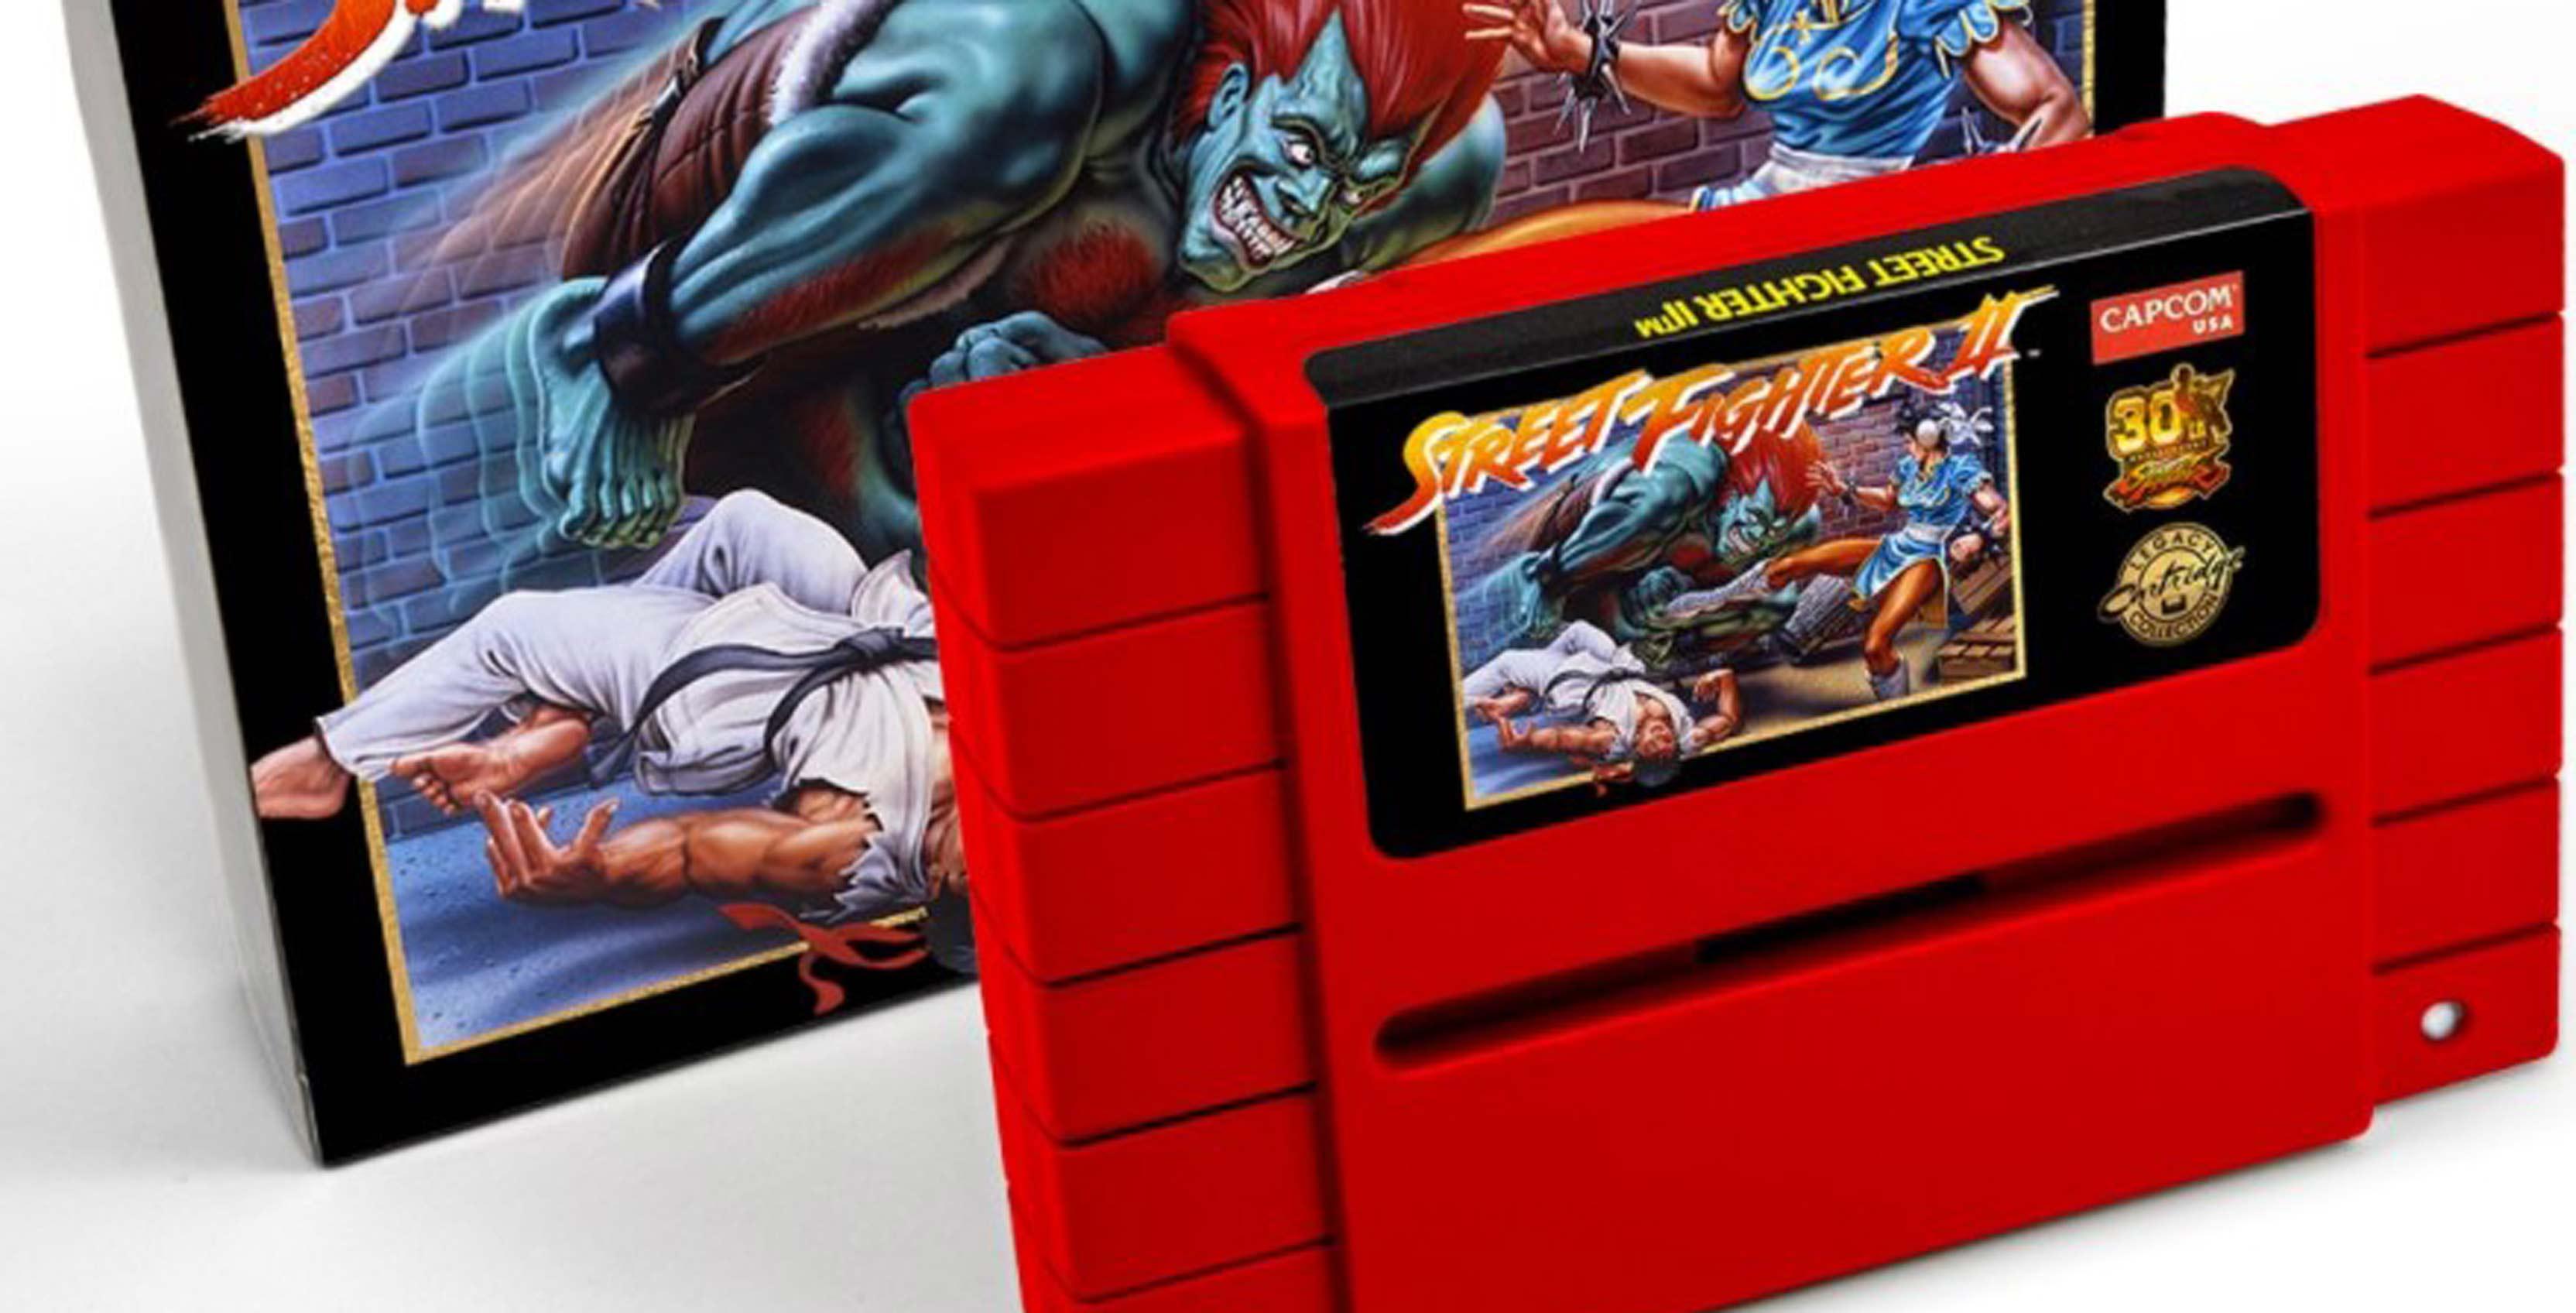 Street Fighter SNES